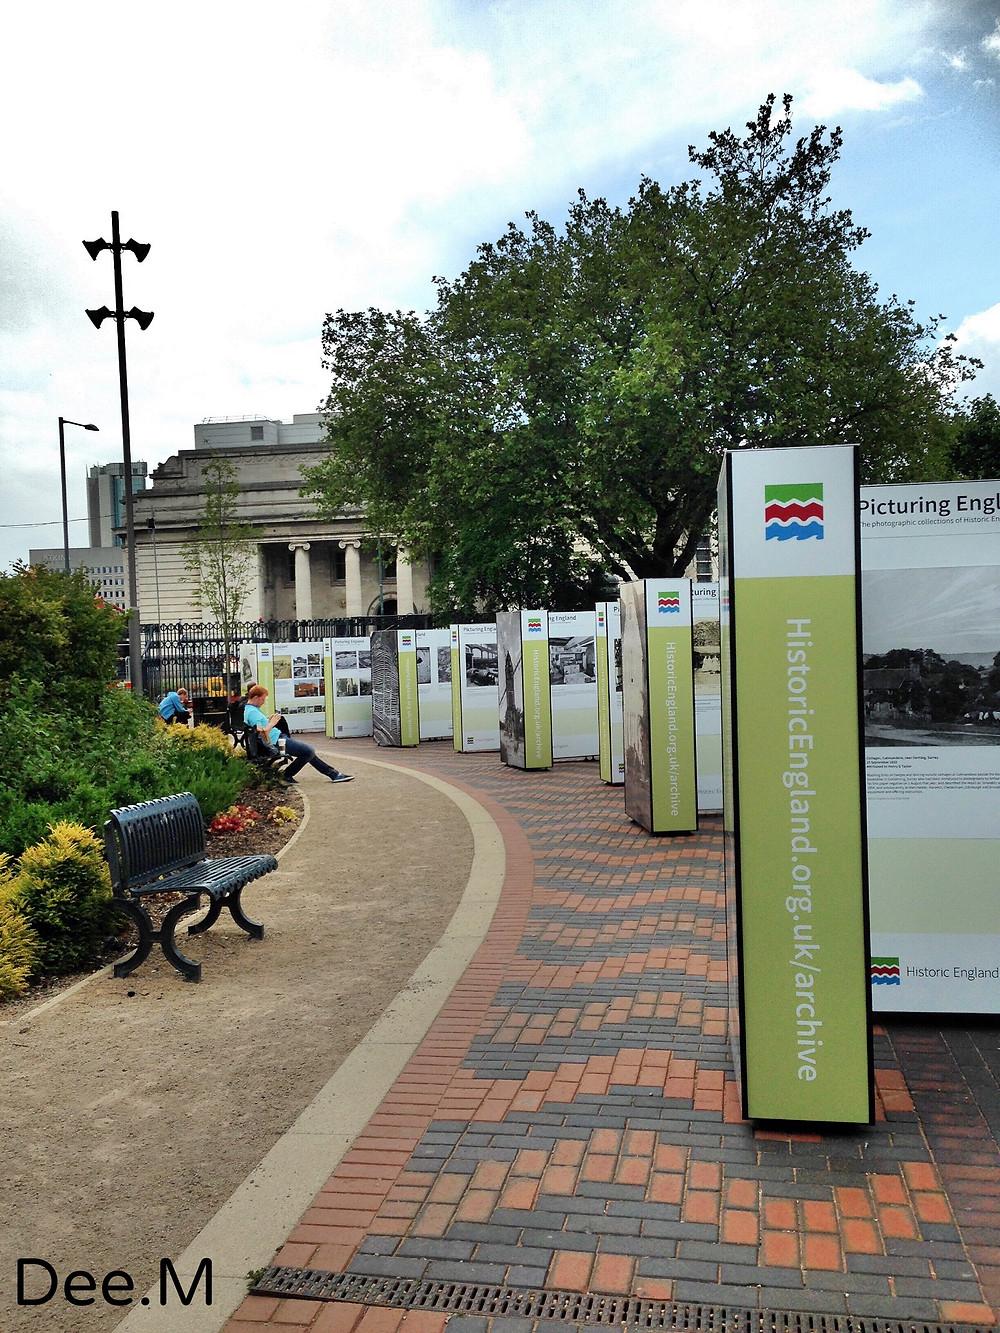 Birmingham Centenary Square